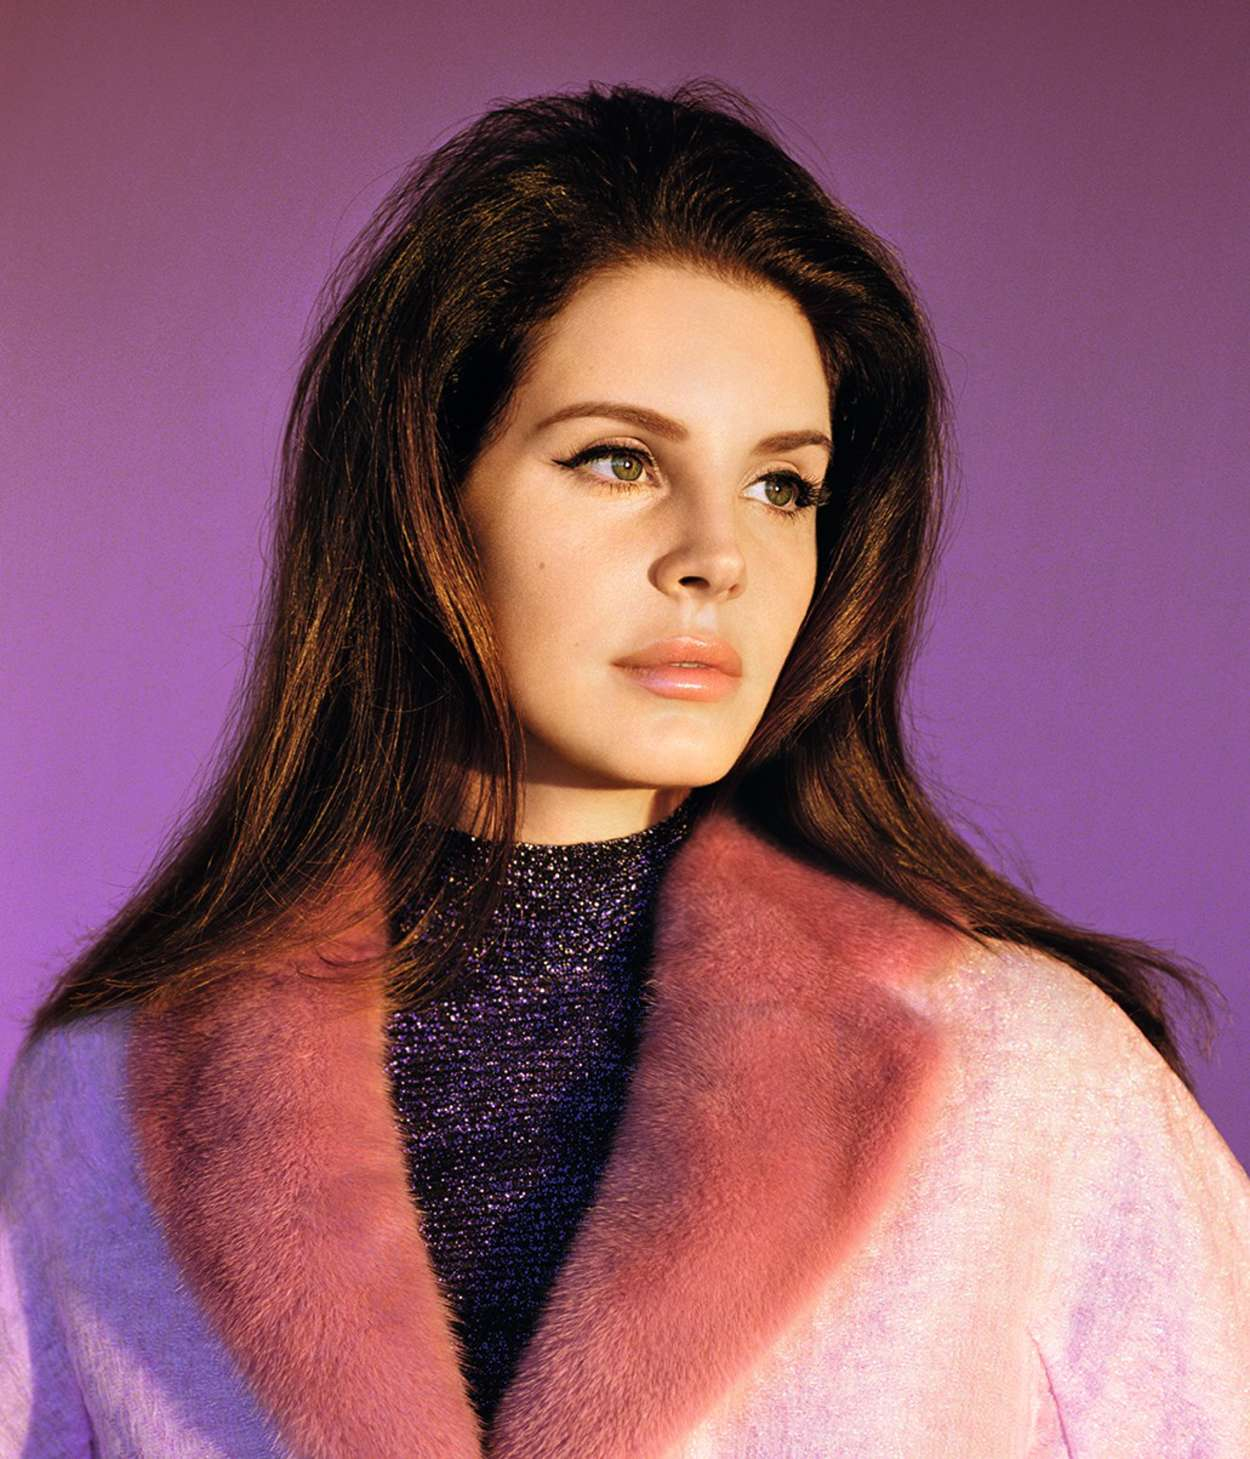 Lana Del Rey 2015 : Lana Del Rey: AnOther Man 2015 -02